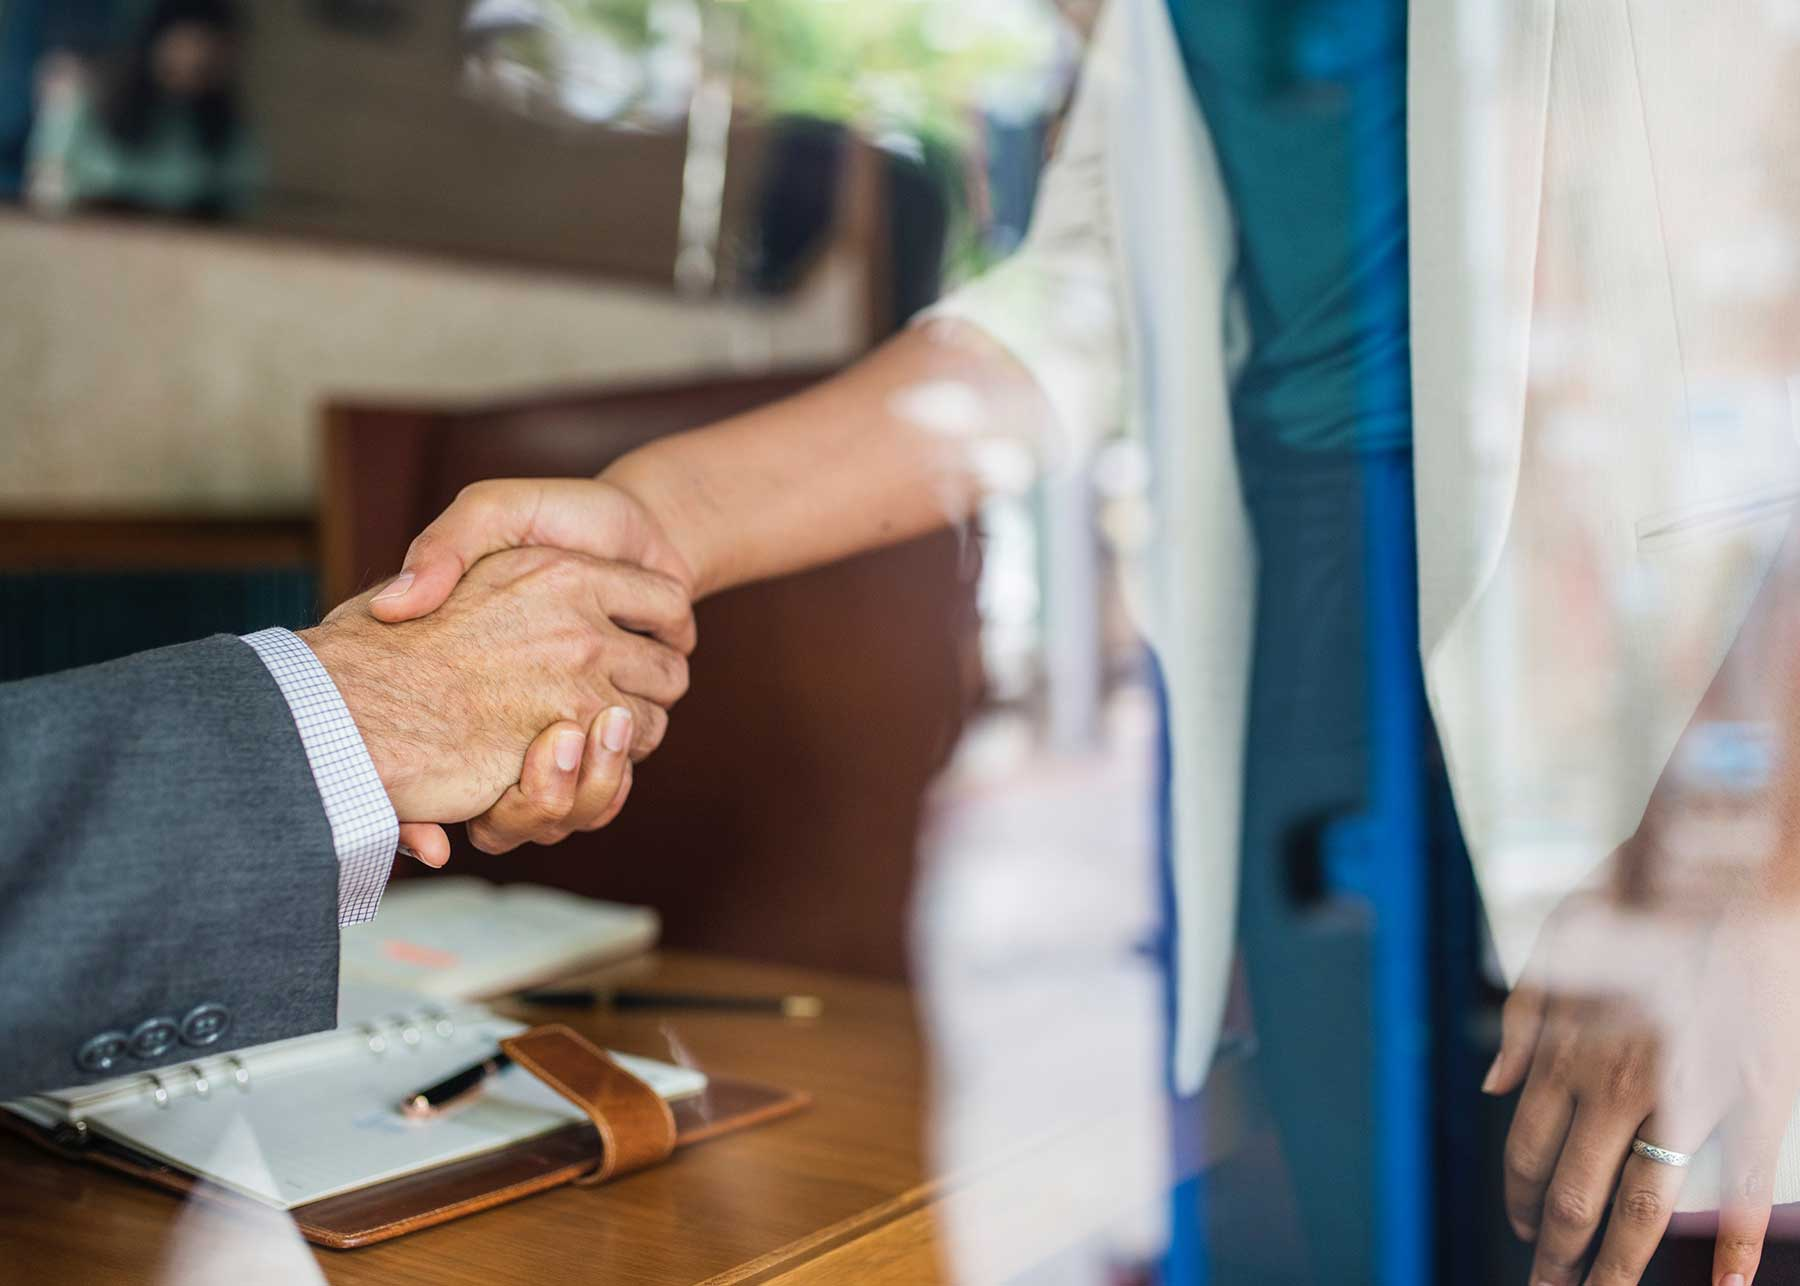 Woman wearing white blazer shakes the hand of a man wearing a blazer